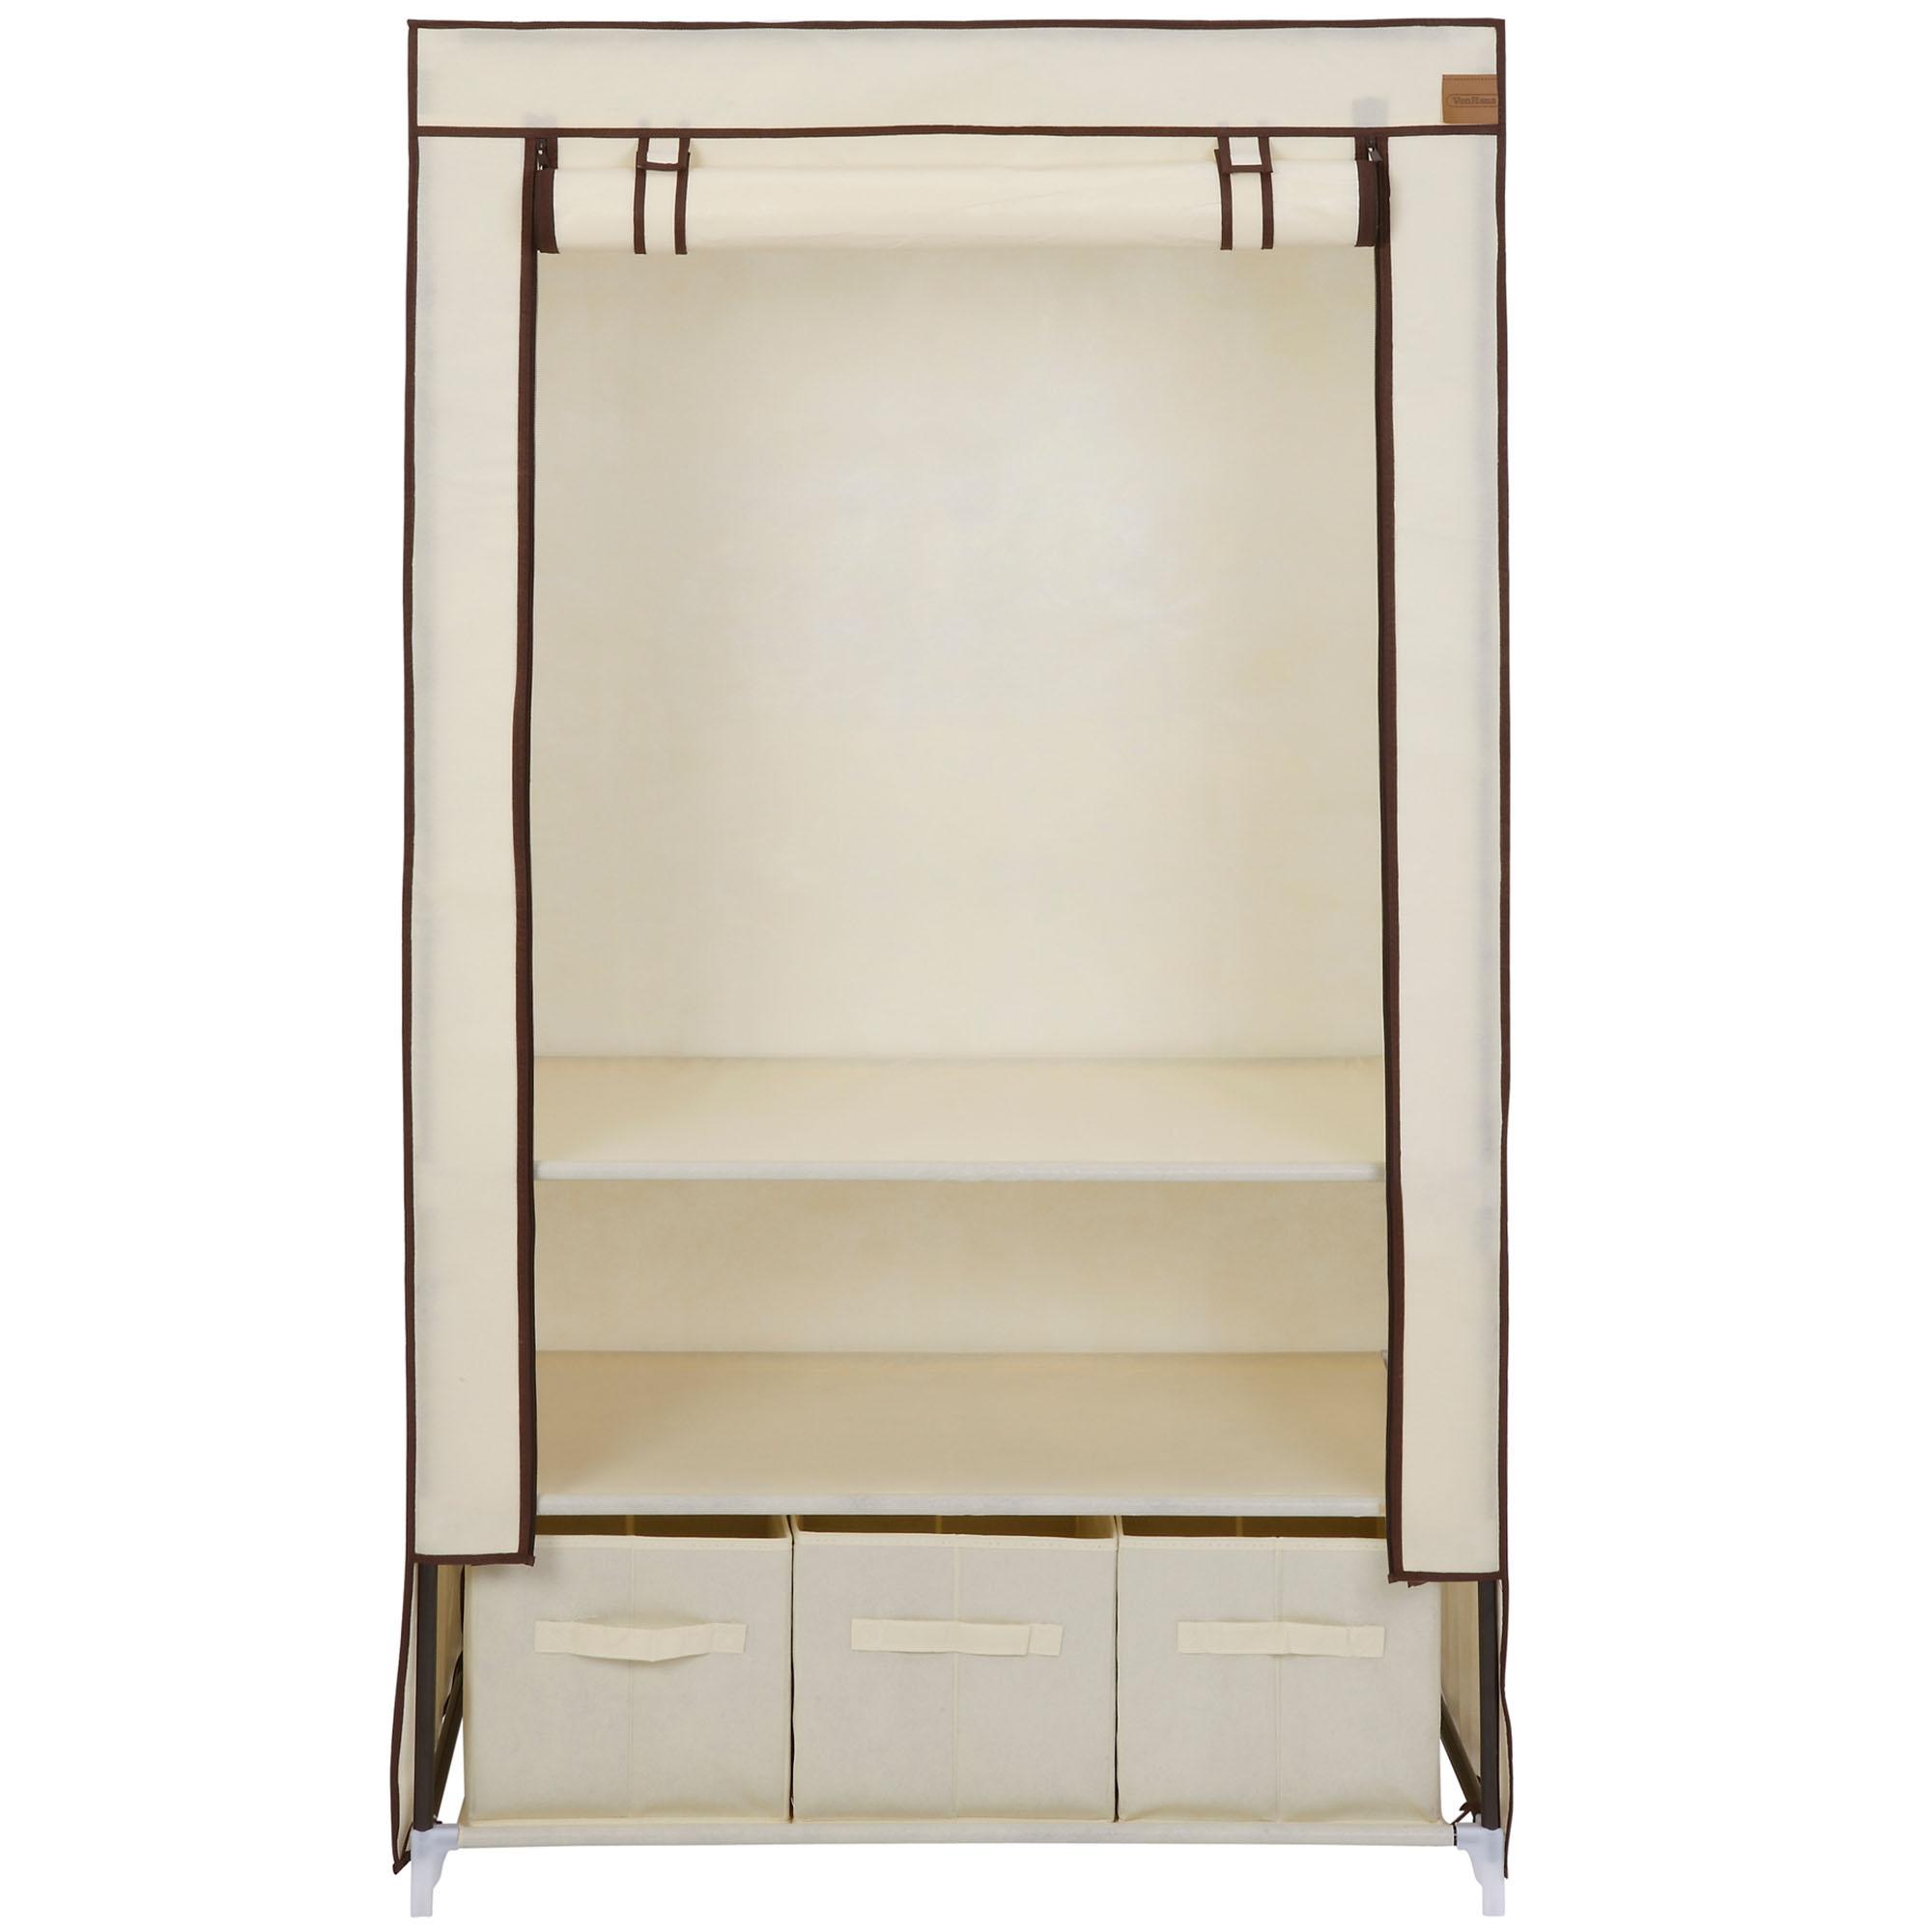 Canvas Storage Boxes For Wardrobes: VonHaus Beige Canvas Effect Strong Clothes Rail Shelves